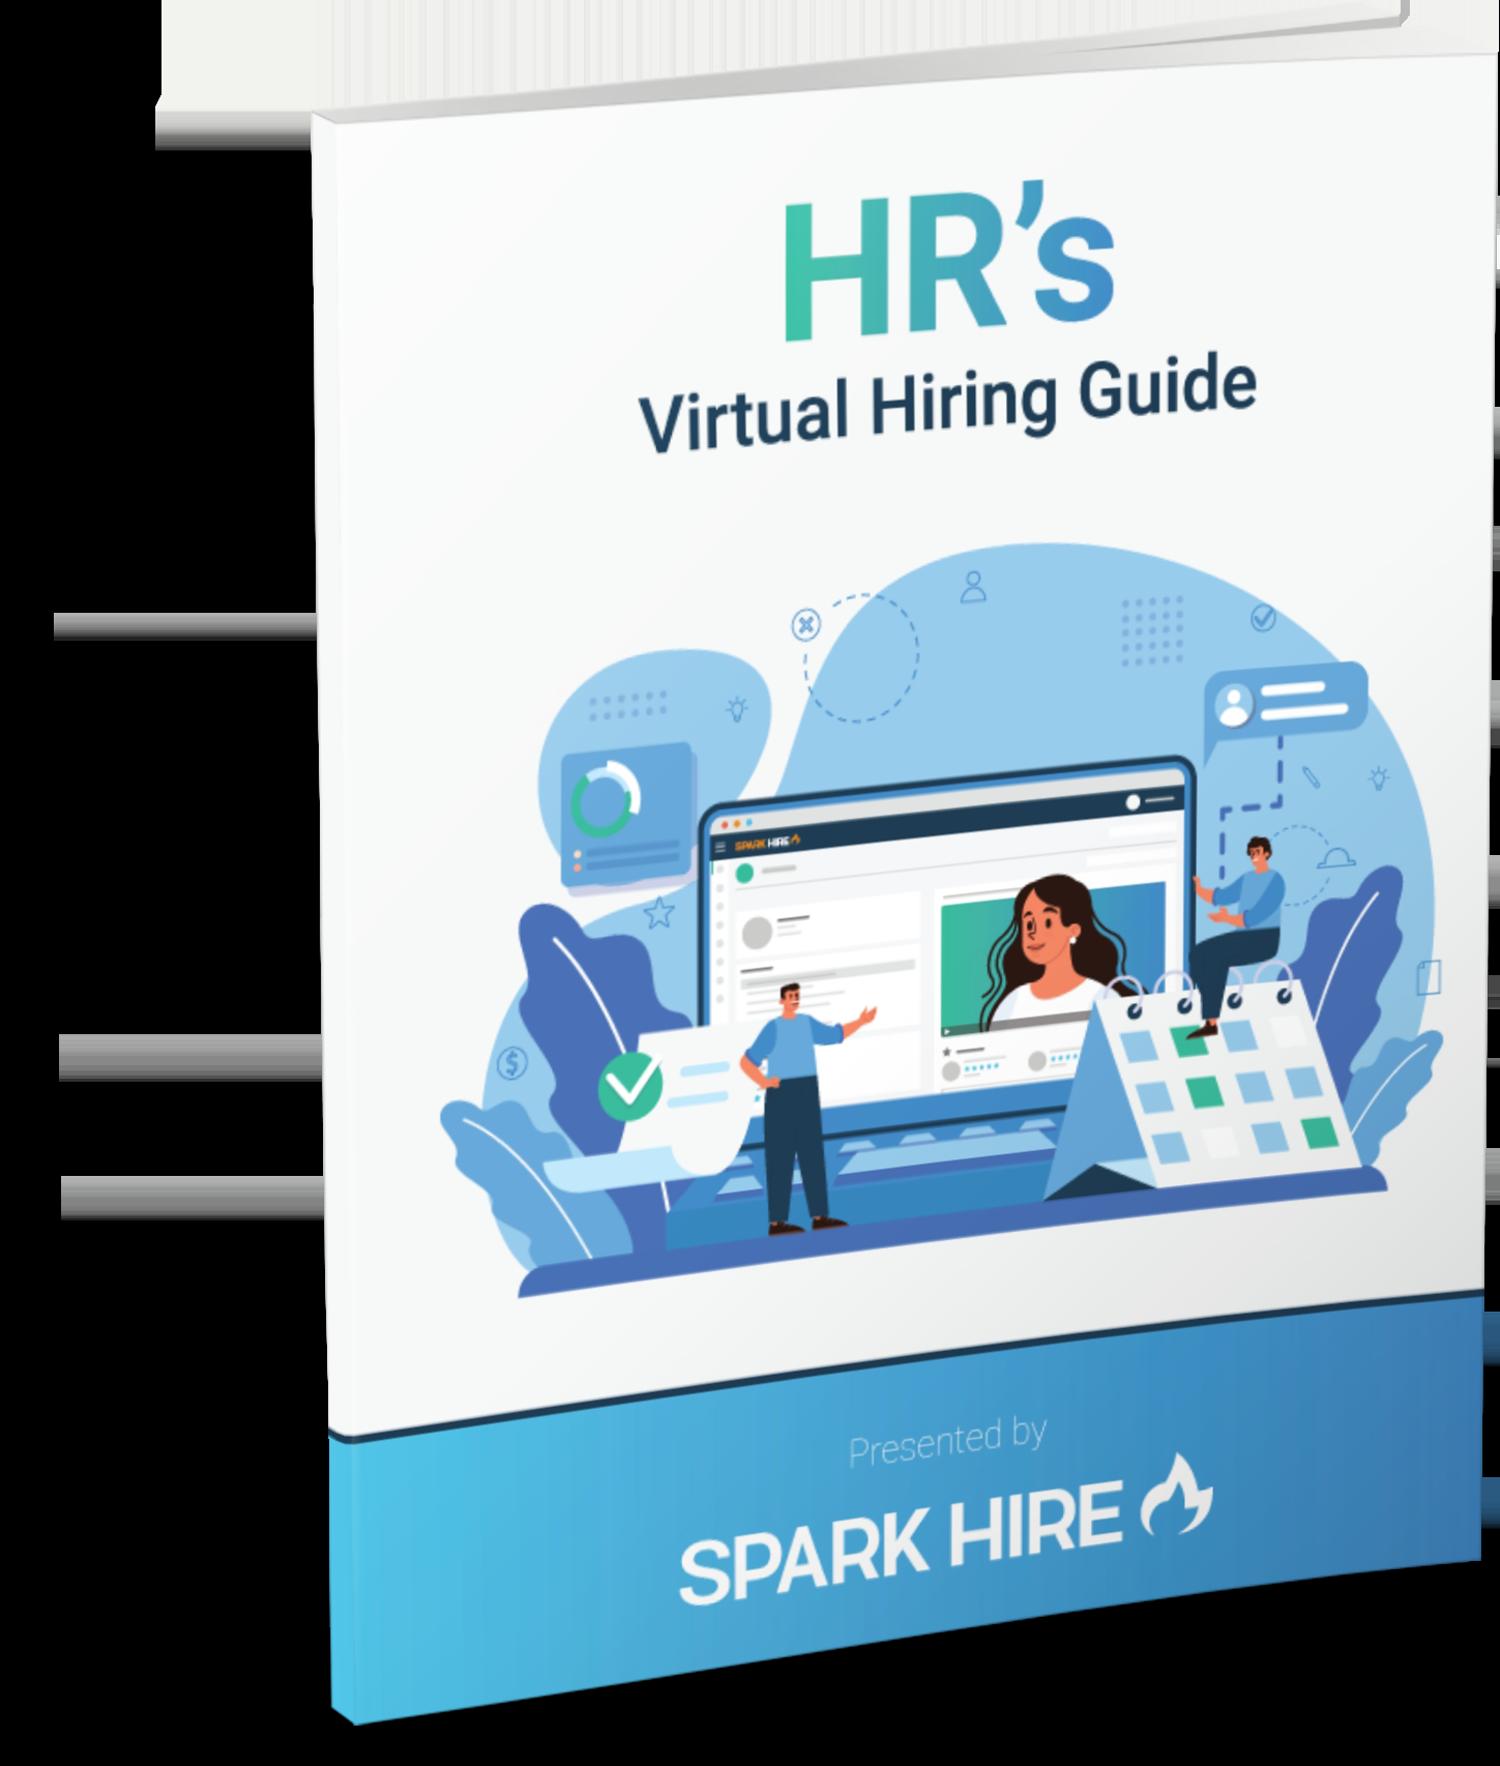 HR's Virtual Hiring Guide